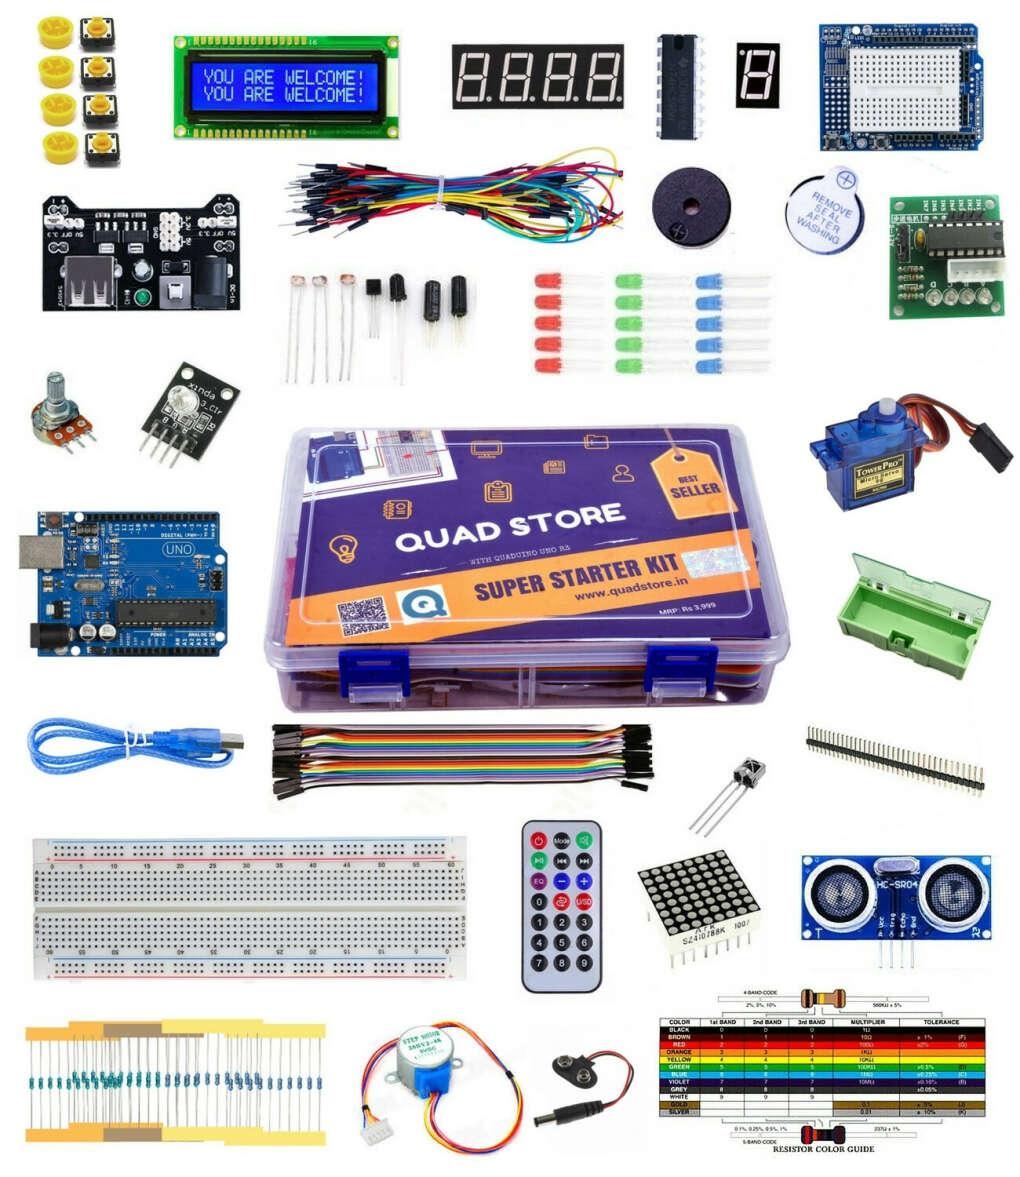 Super Starter Arduino Kit India Online with Uno R3 (Beginner's Kit) - Quad Store